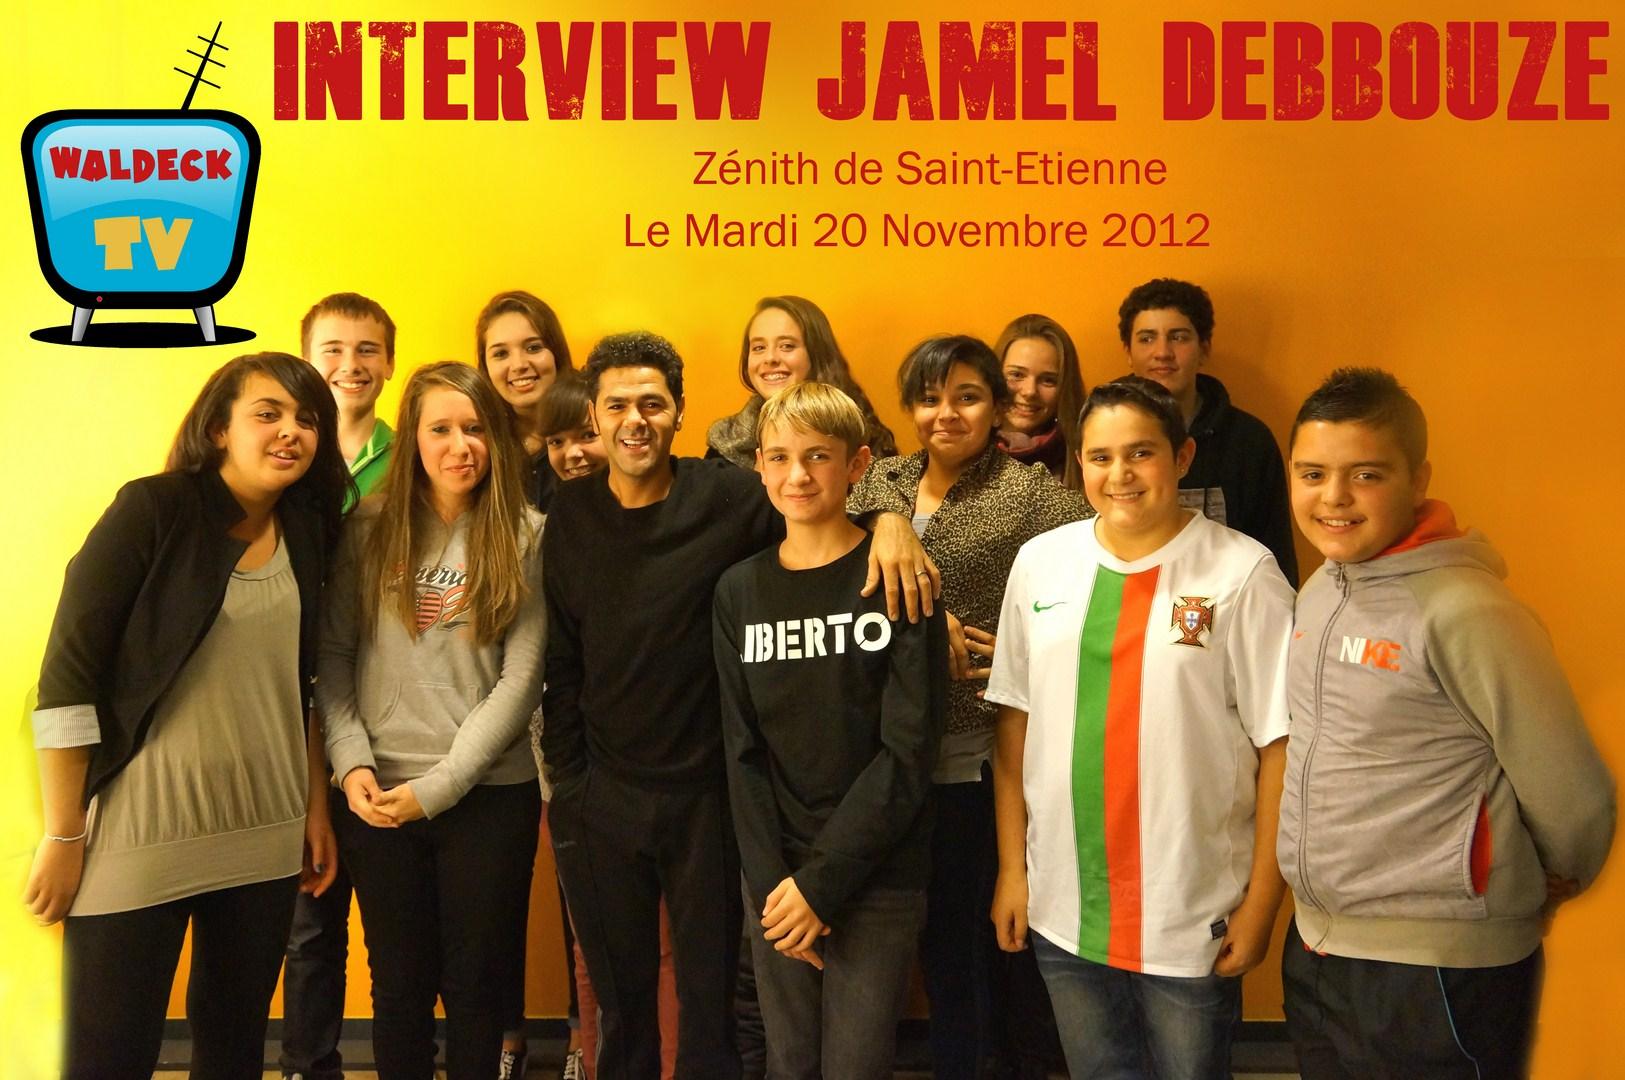 interview jamel debbouze sur waldeck TV